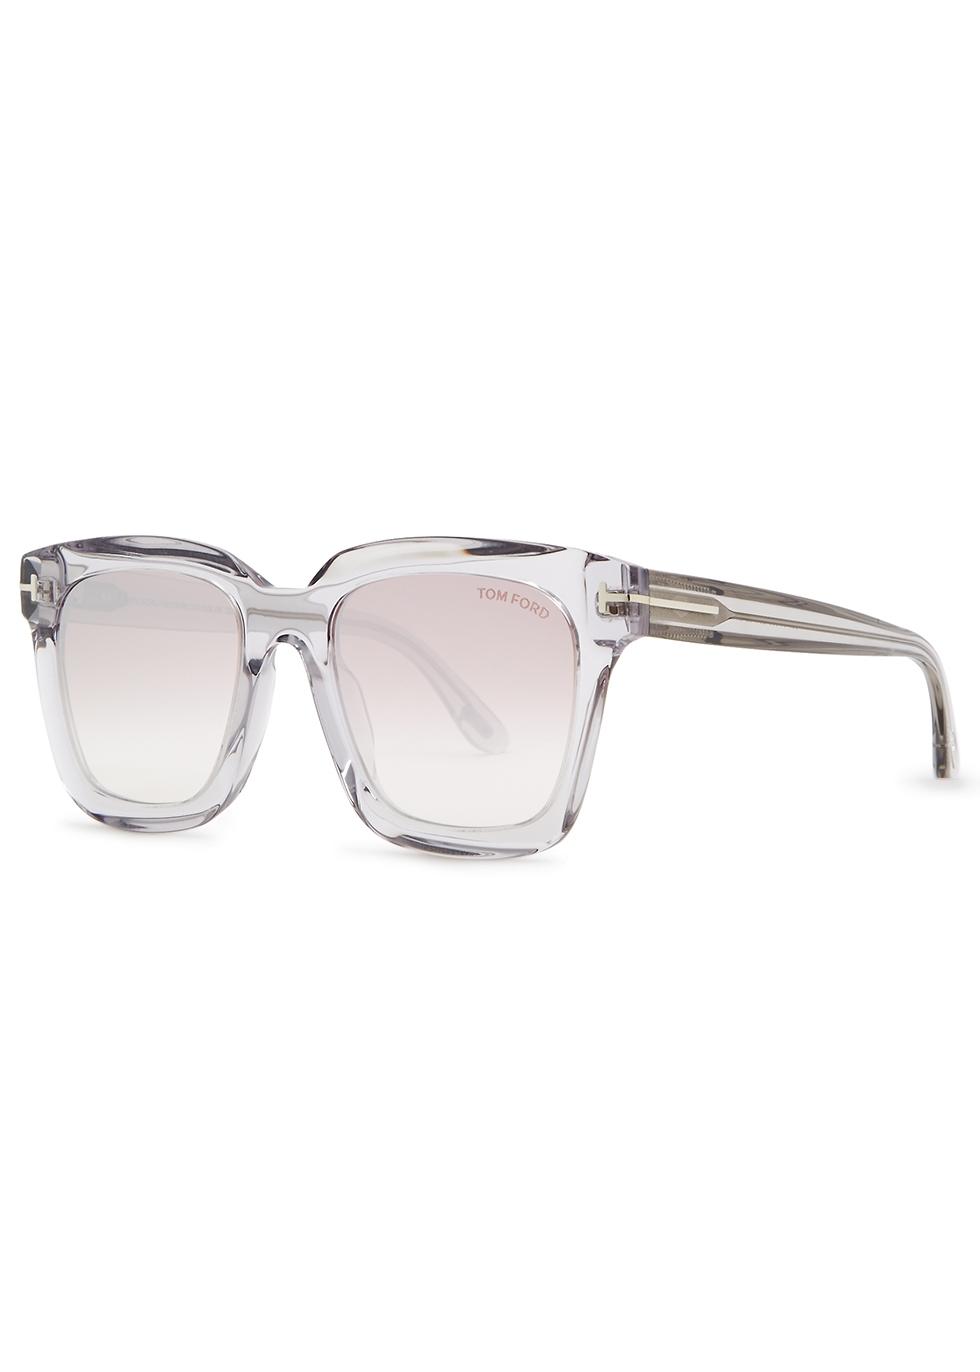 Sari transparent acetate square-frame sunglasses - Tom Ford Eyewear